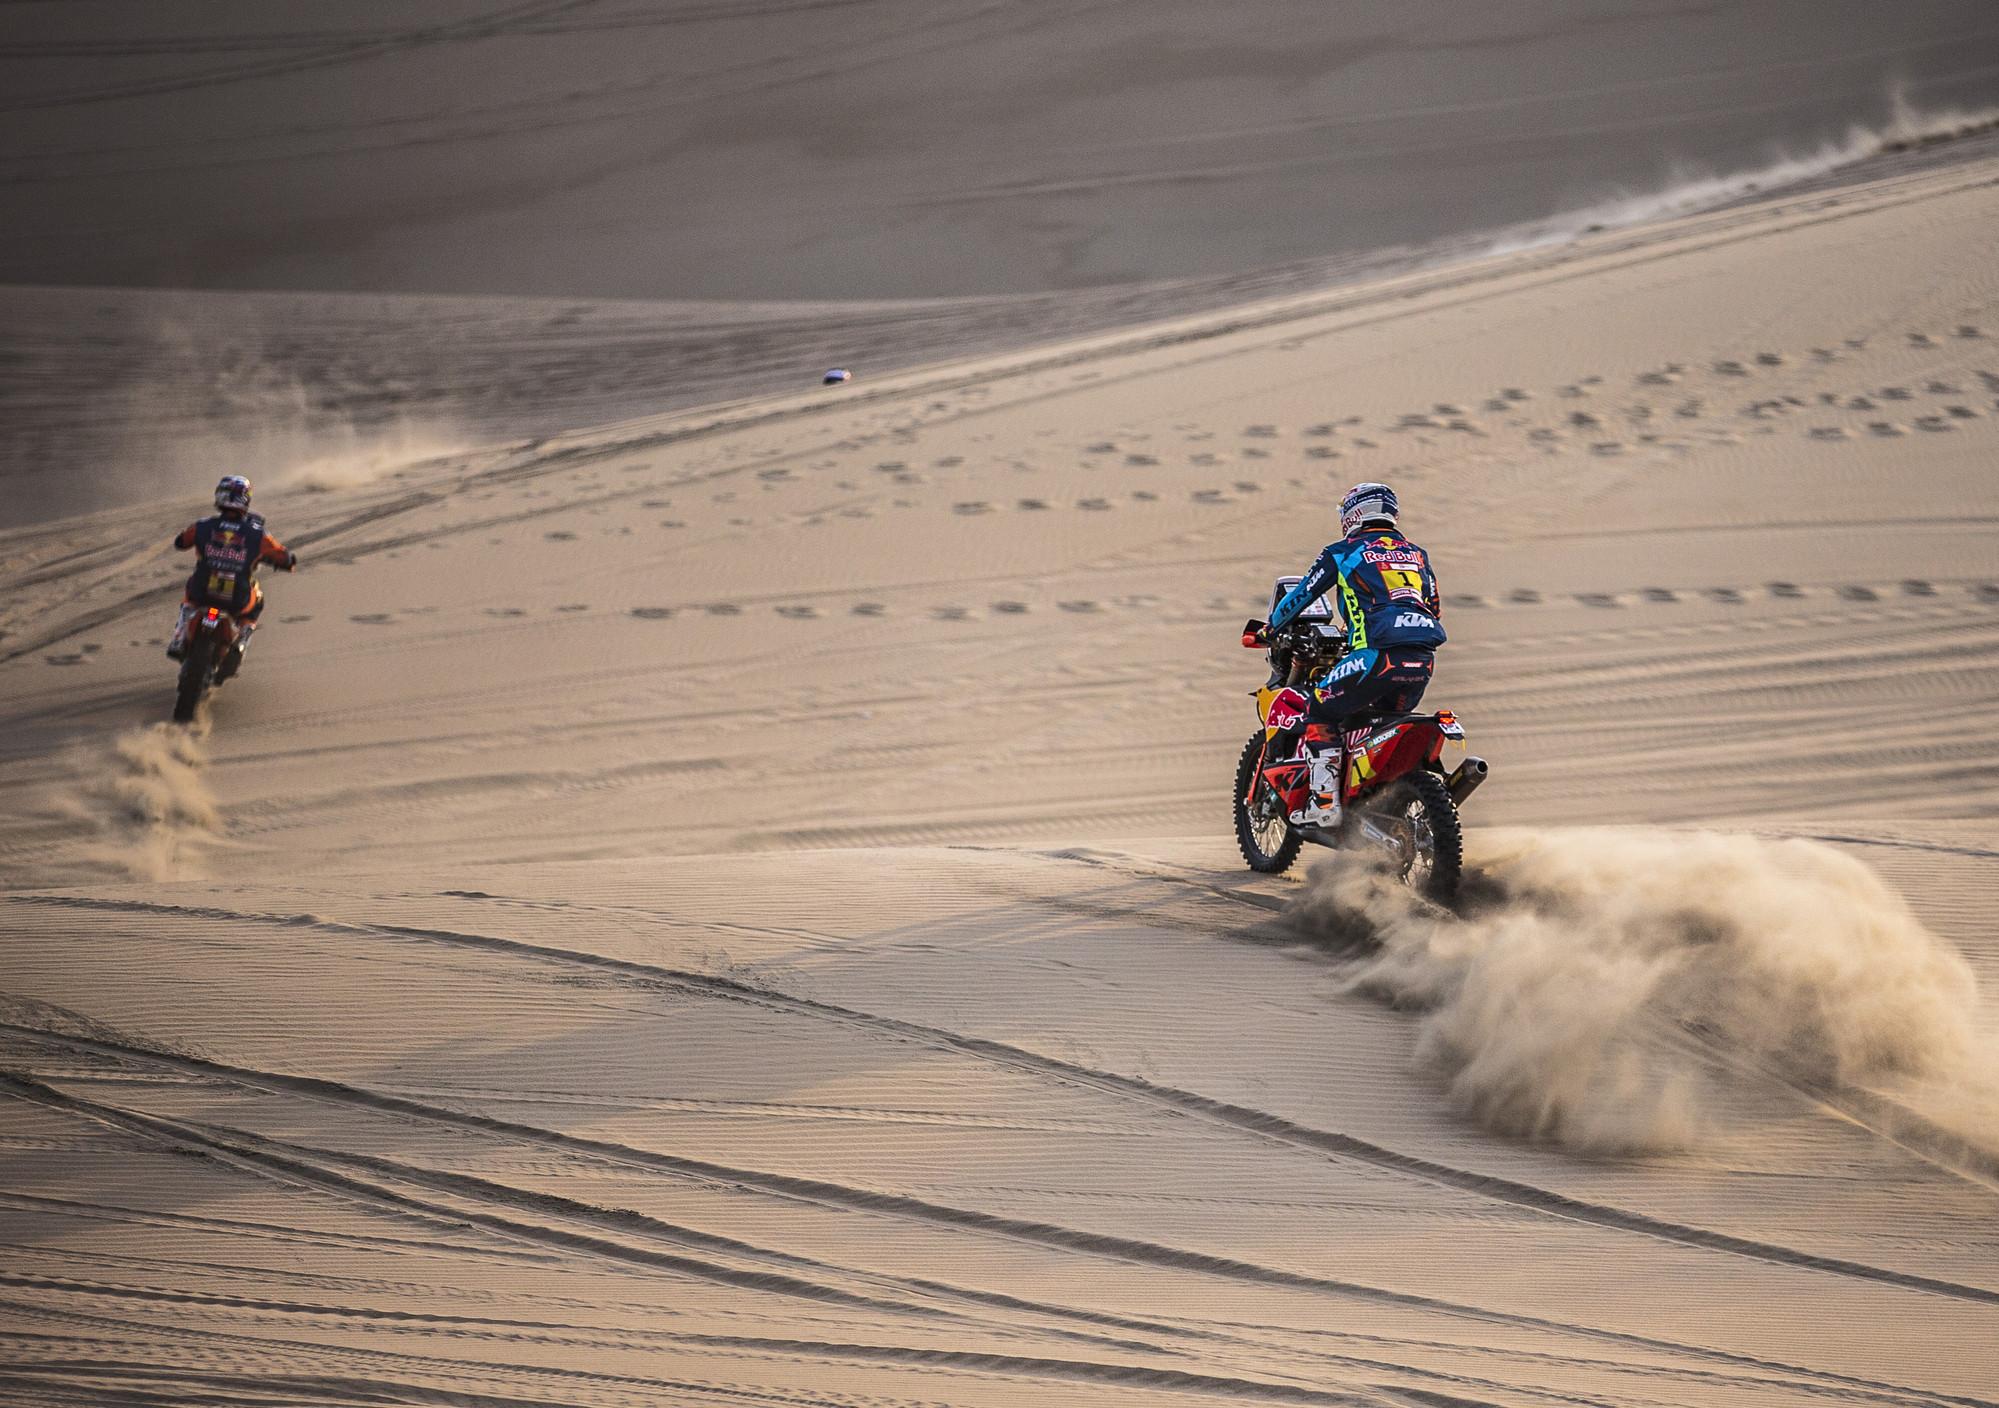 263176_misc_stage9_Red Bull KTM Factory Racing_Dakar2019_435.jpg